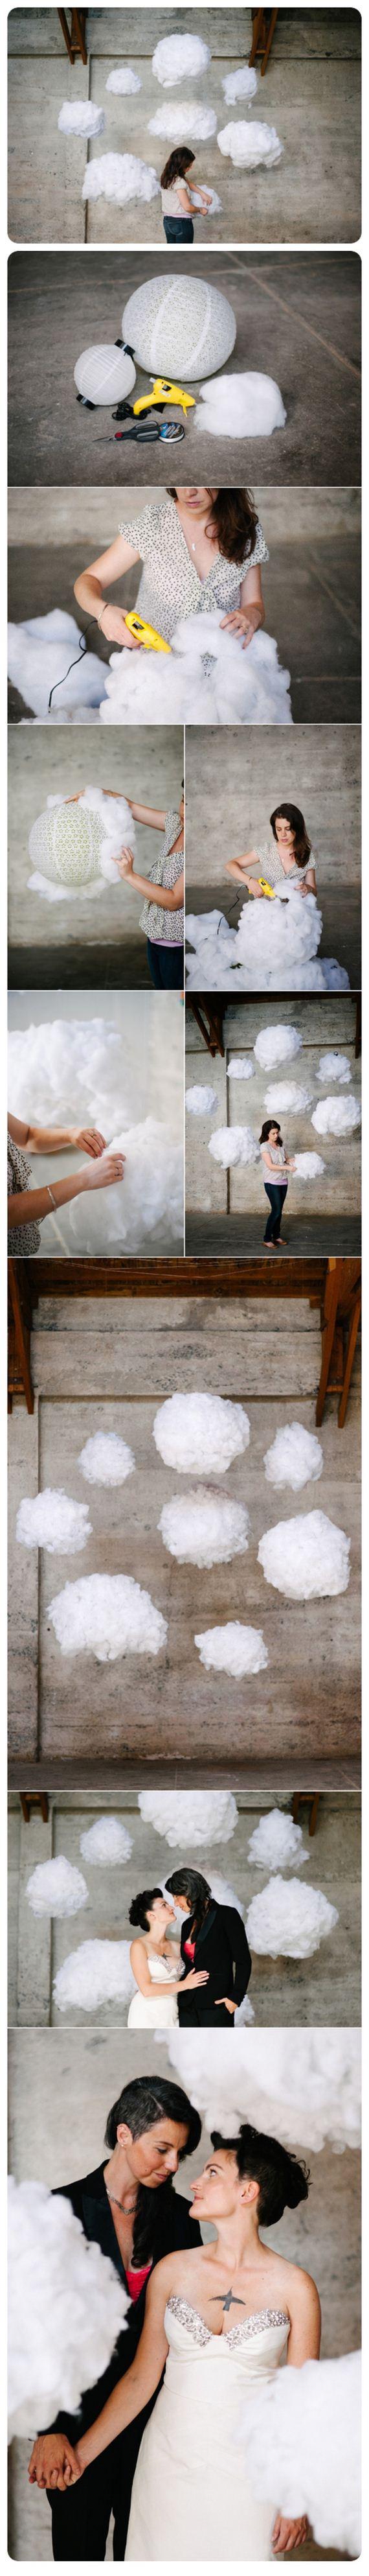 02-diy-balloon-cloud-decoration